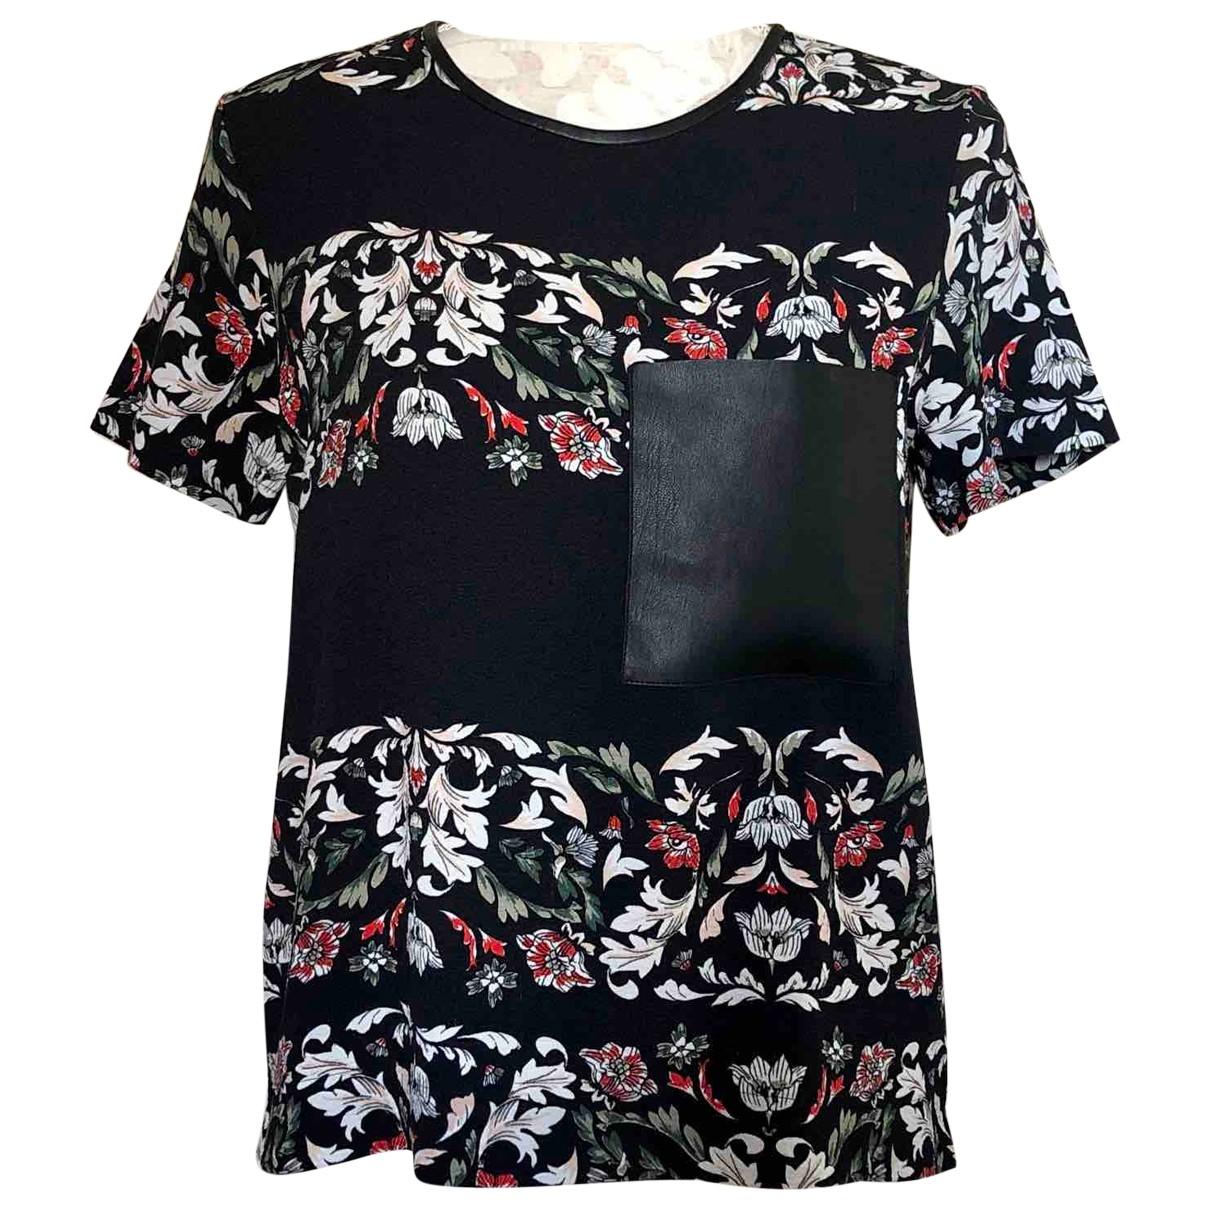 Zara \N Black  top for Women S International